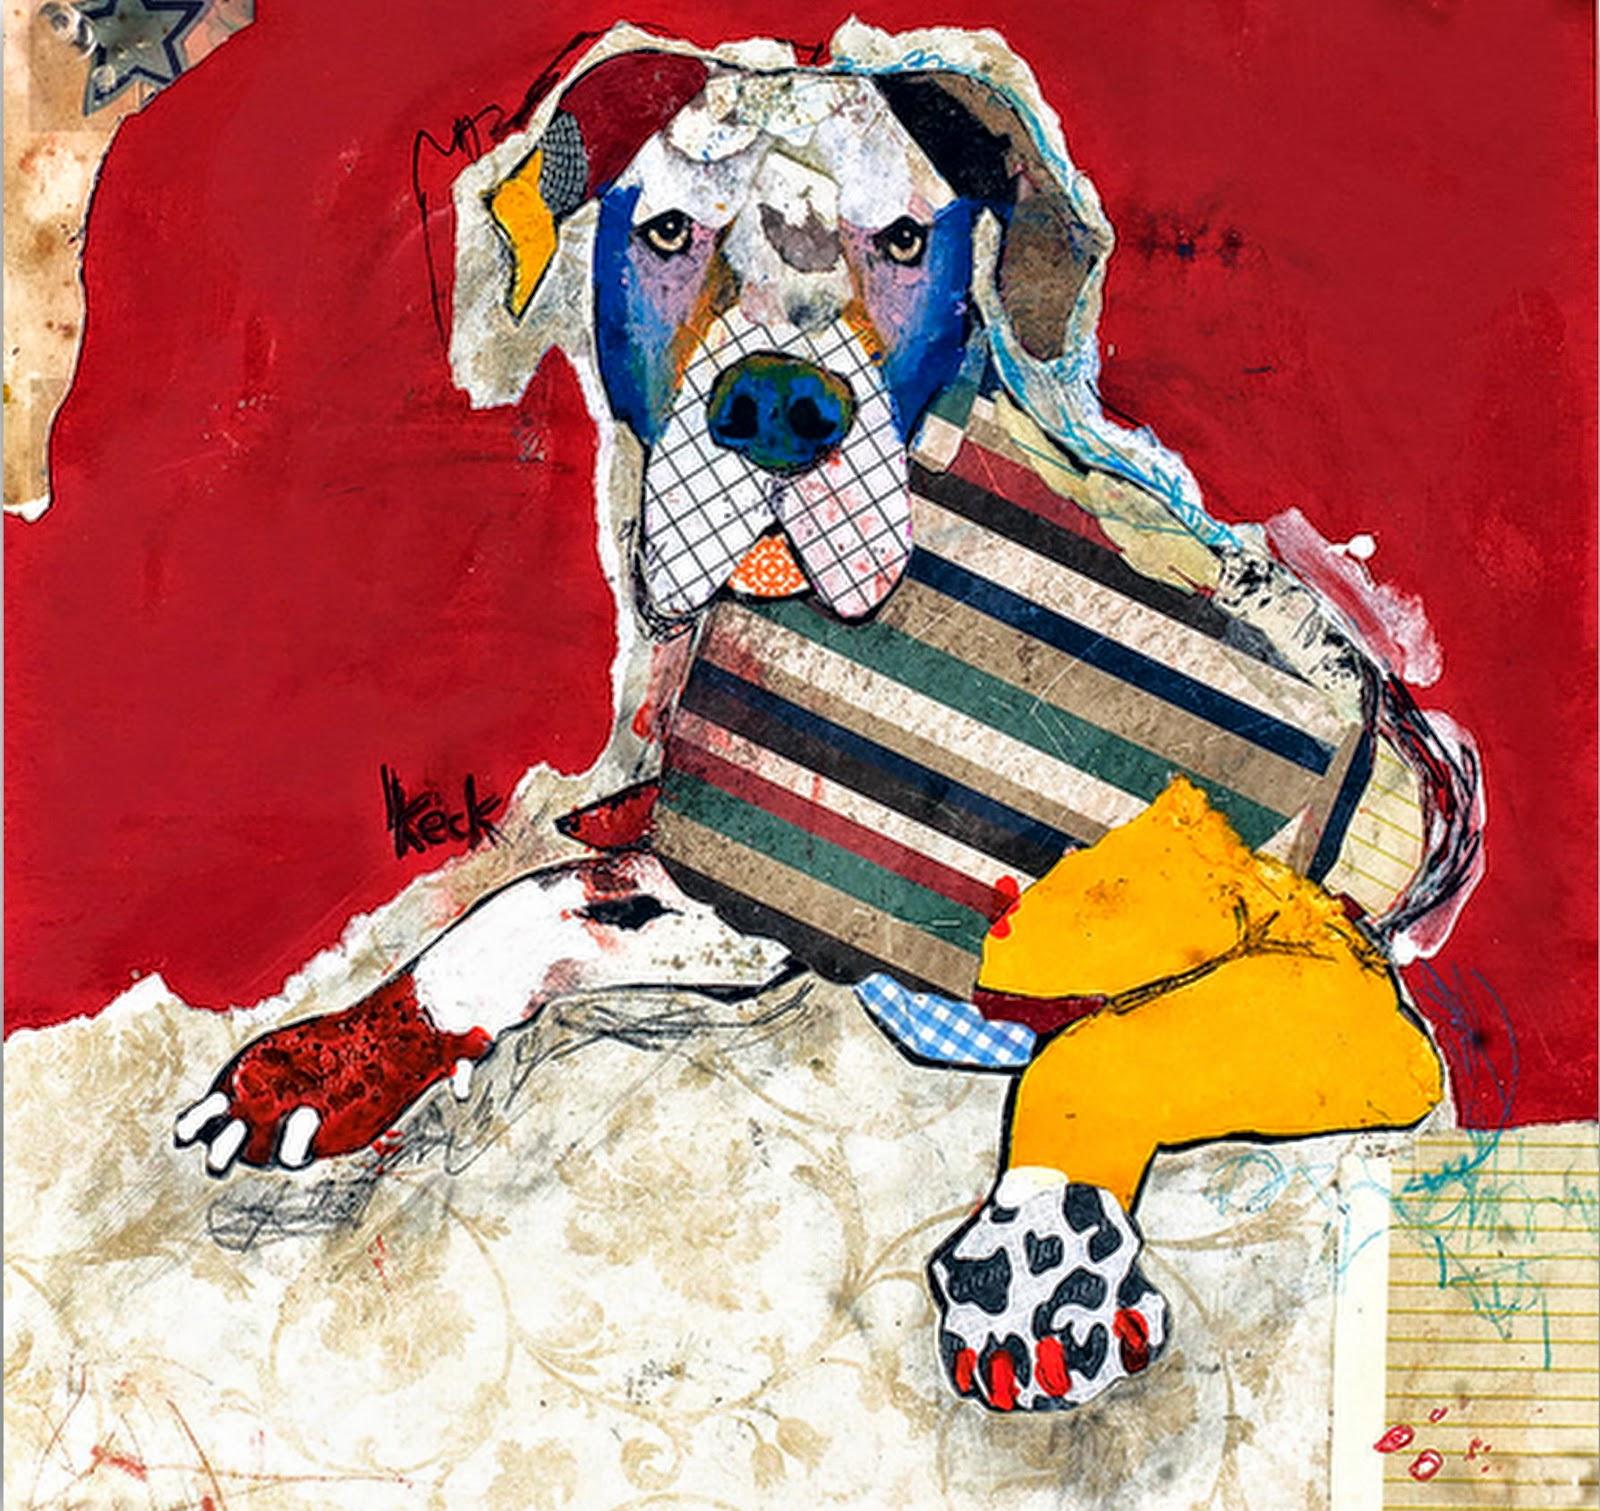 pinturas-al-oleo-con-mascotas